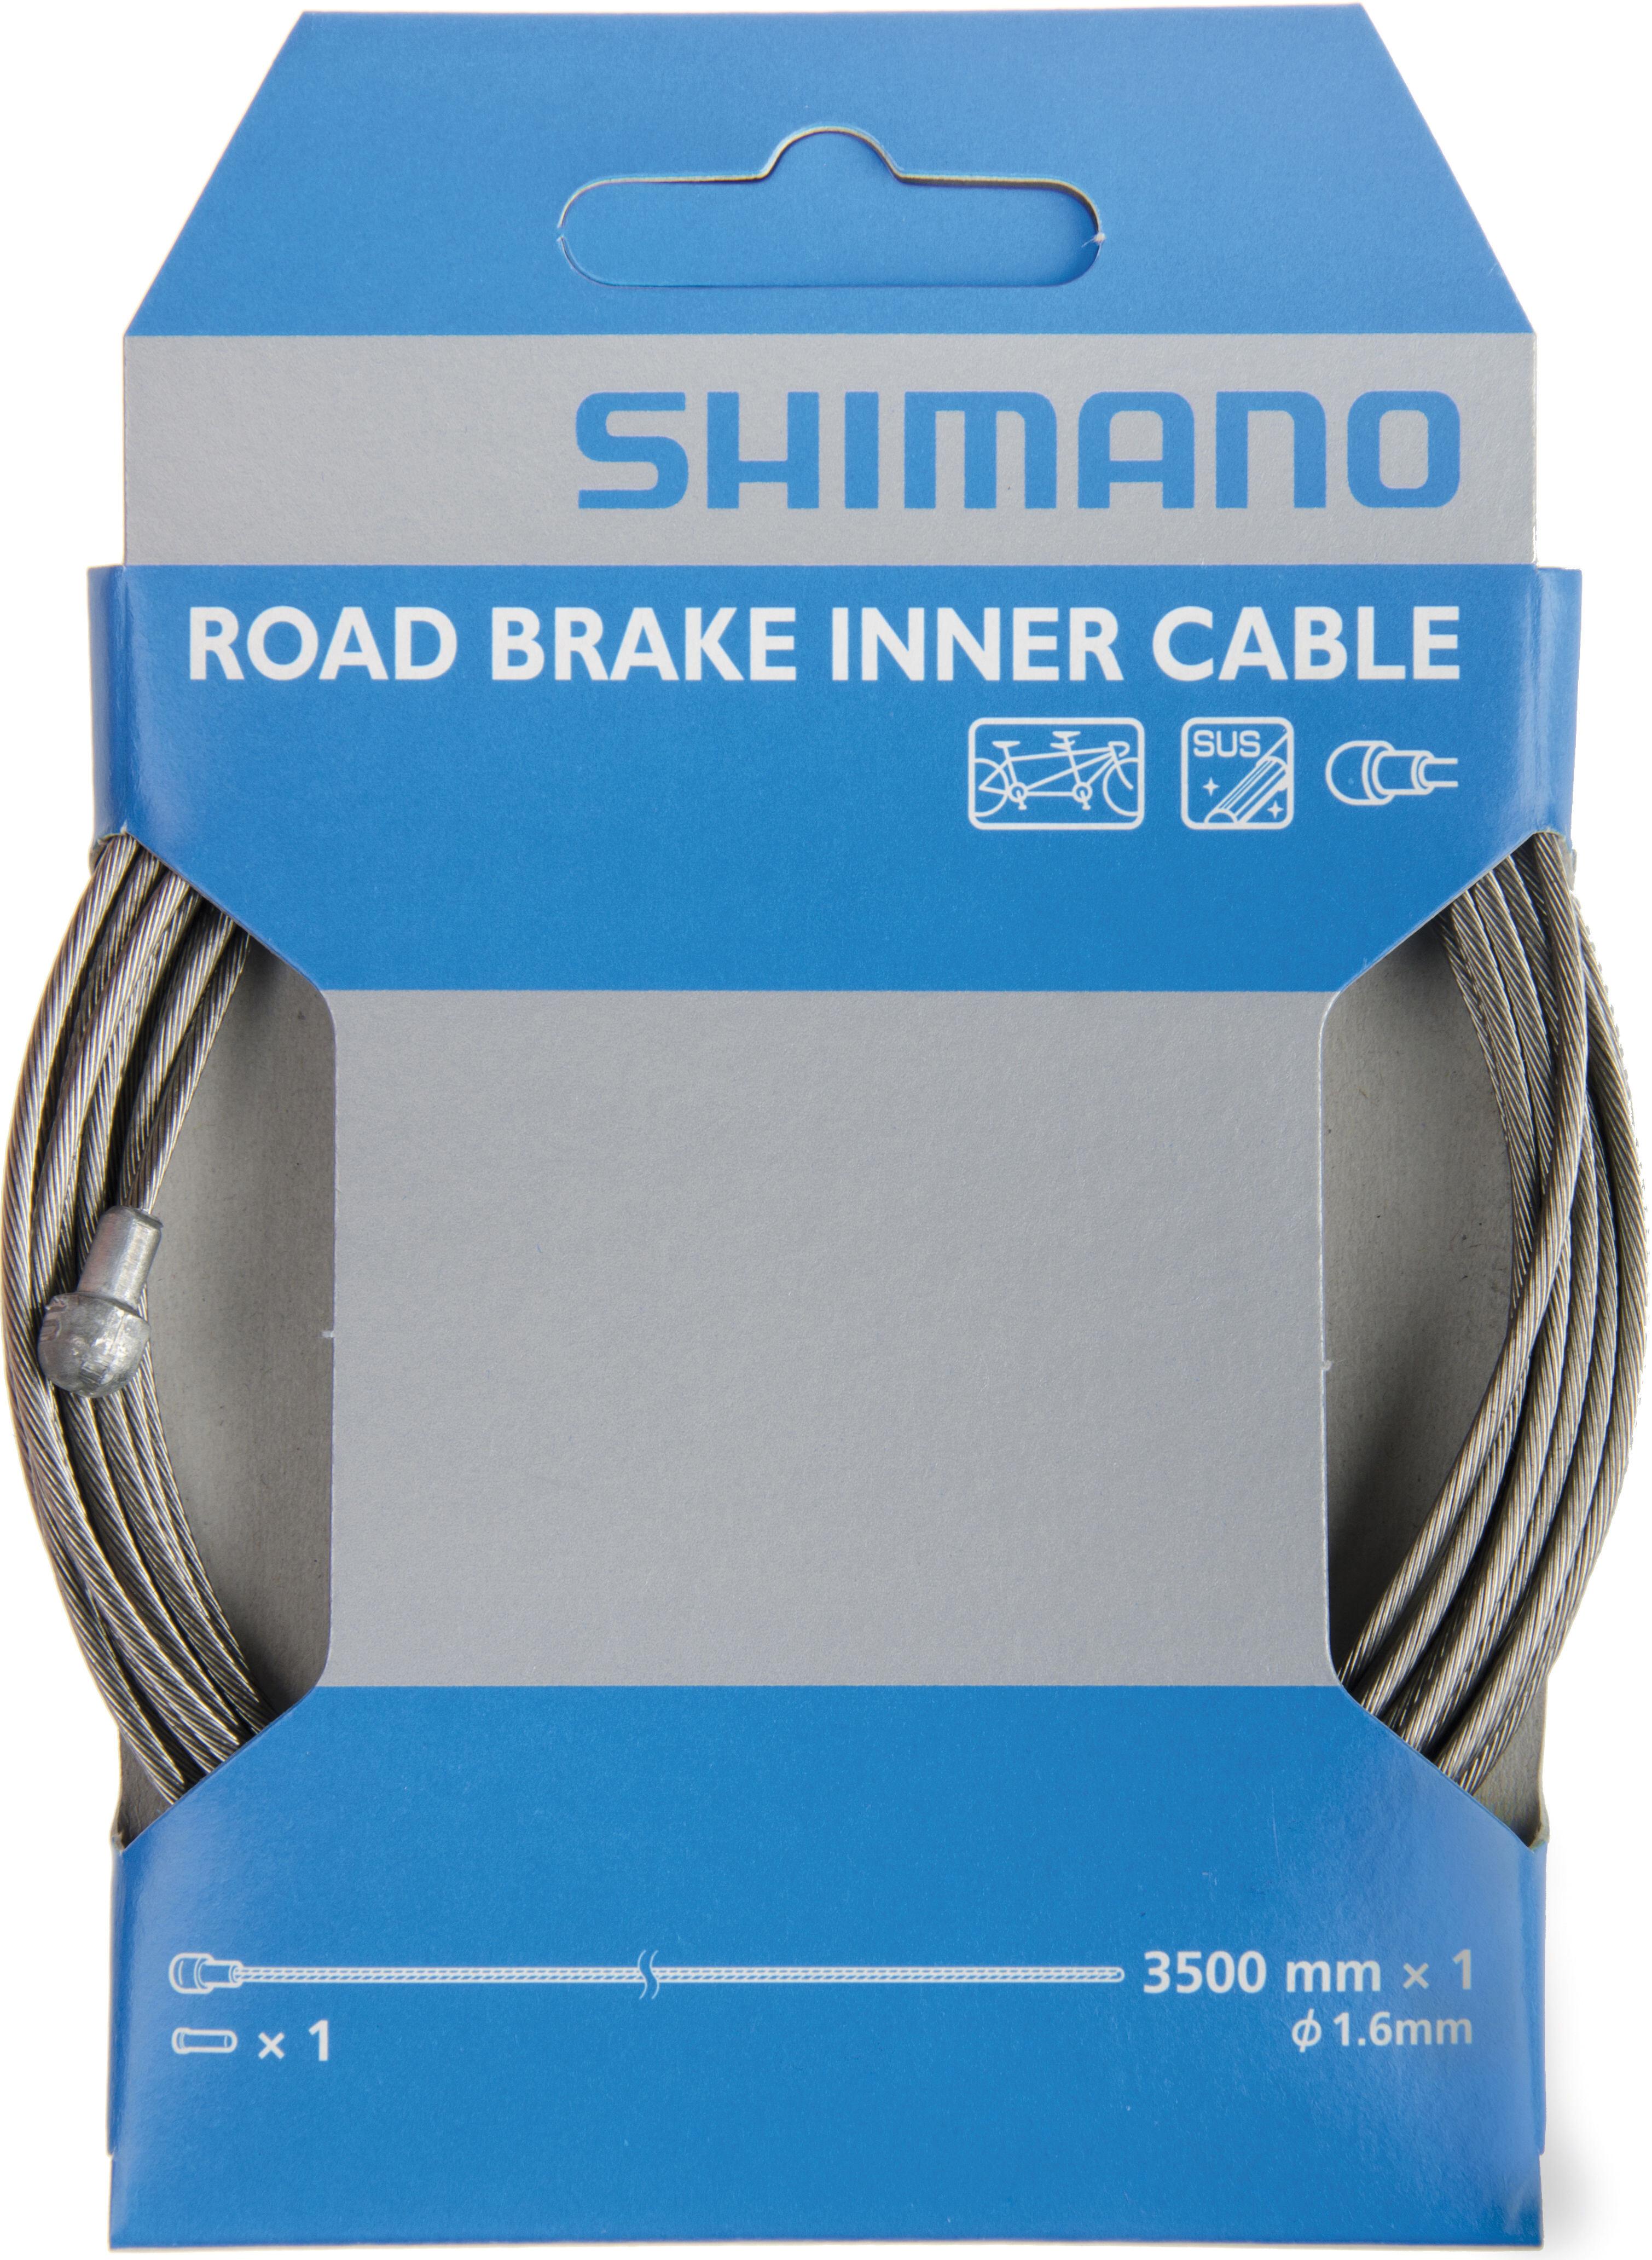 Shimano XTR Bremszüge und Aussenhülle Bremszug NEU